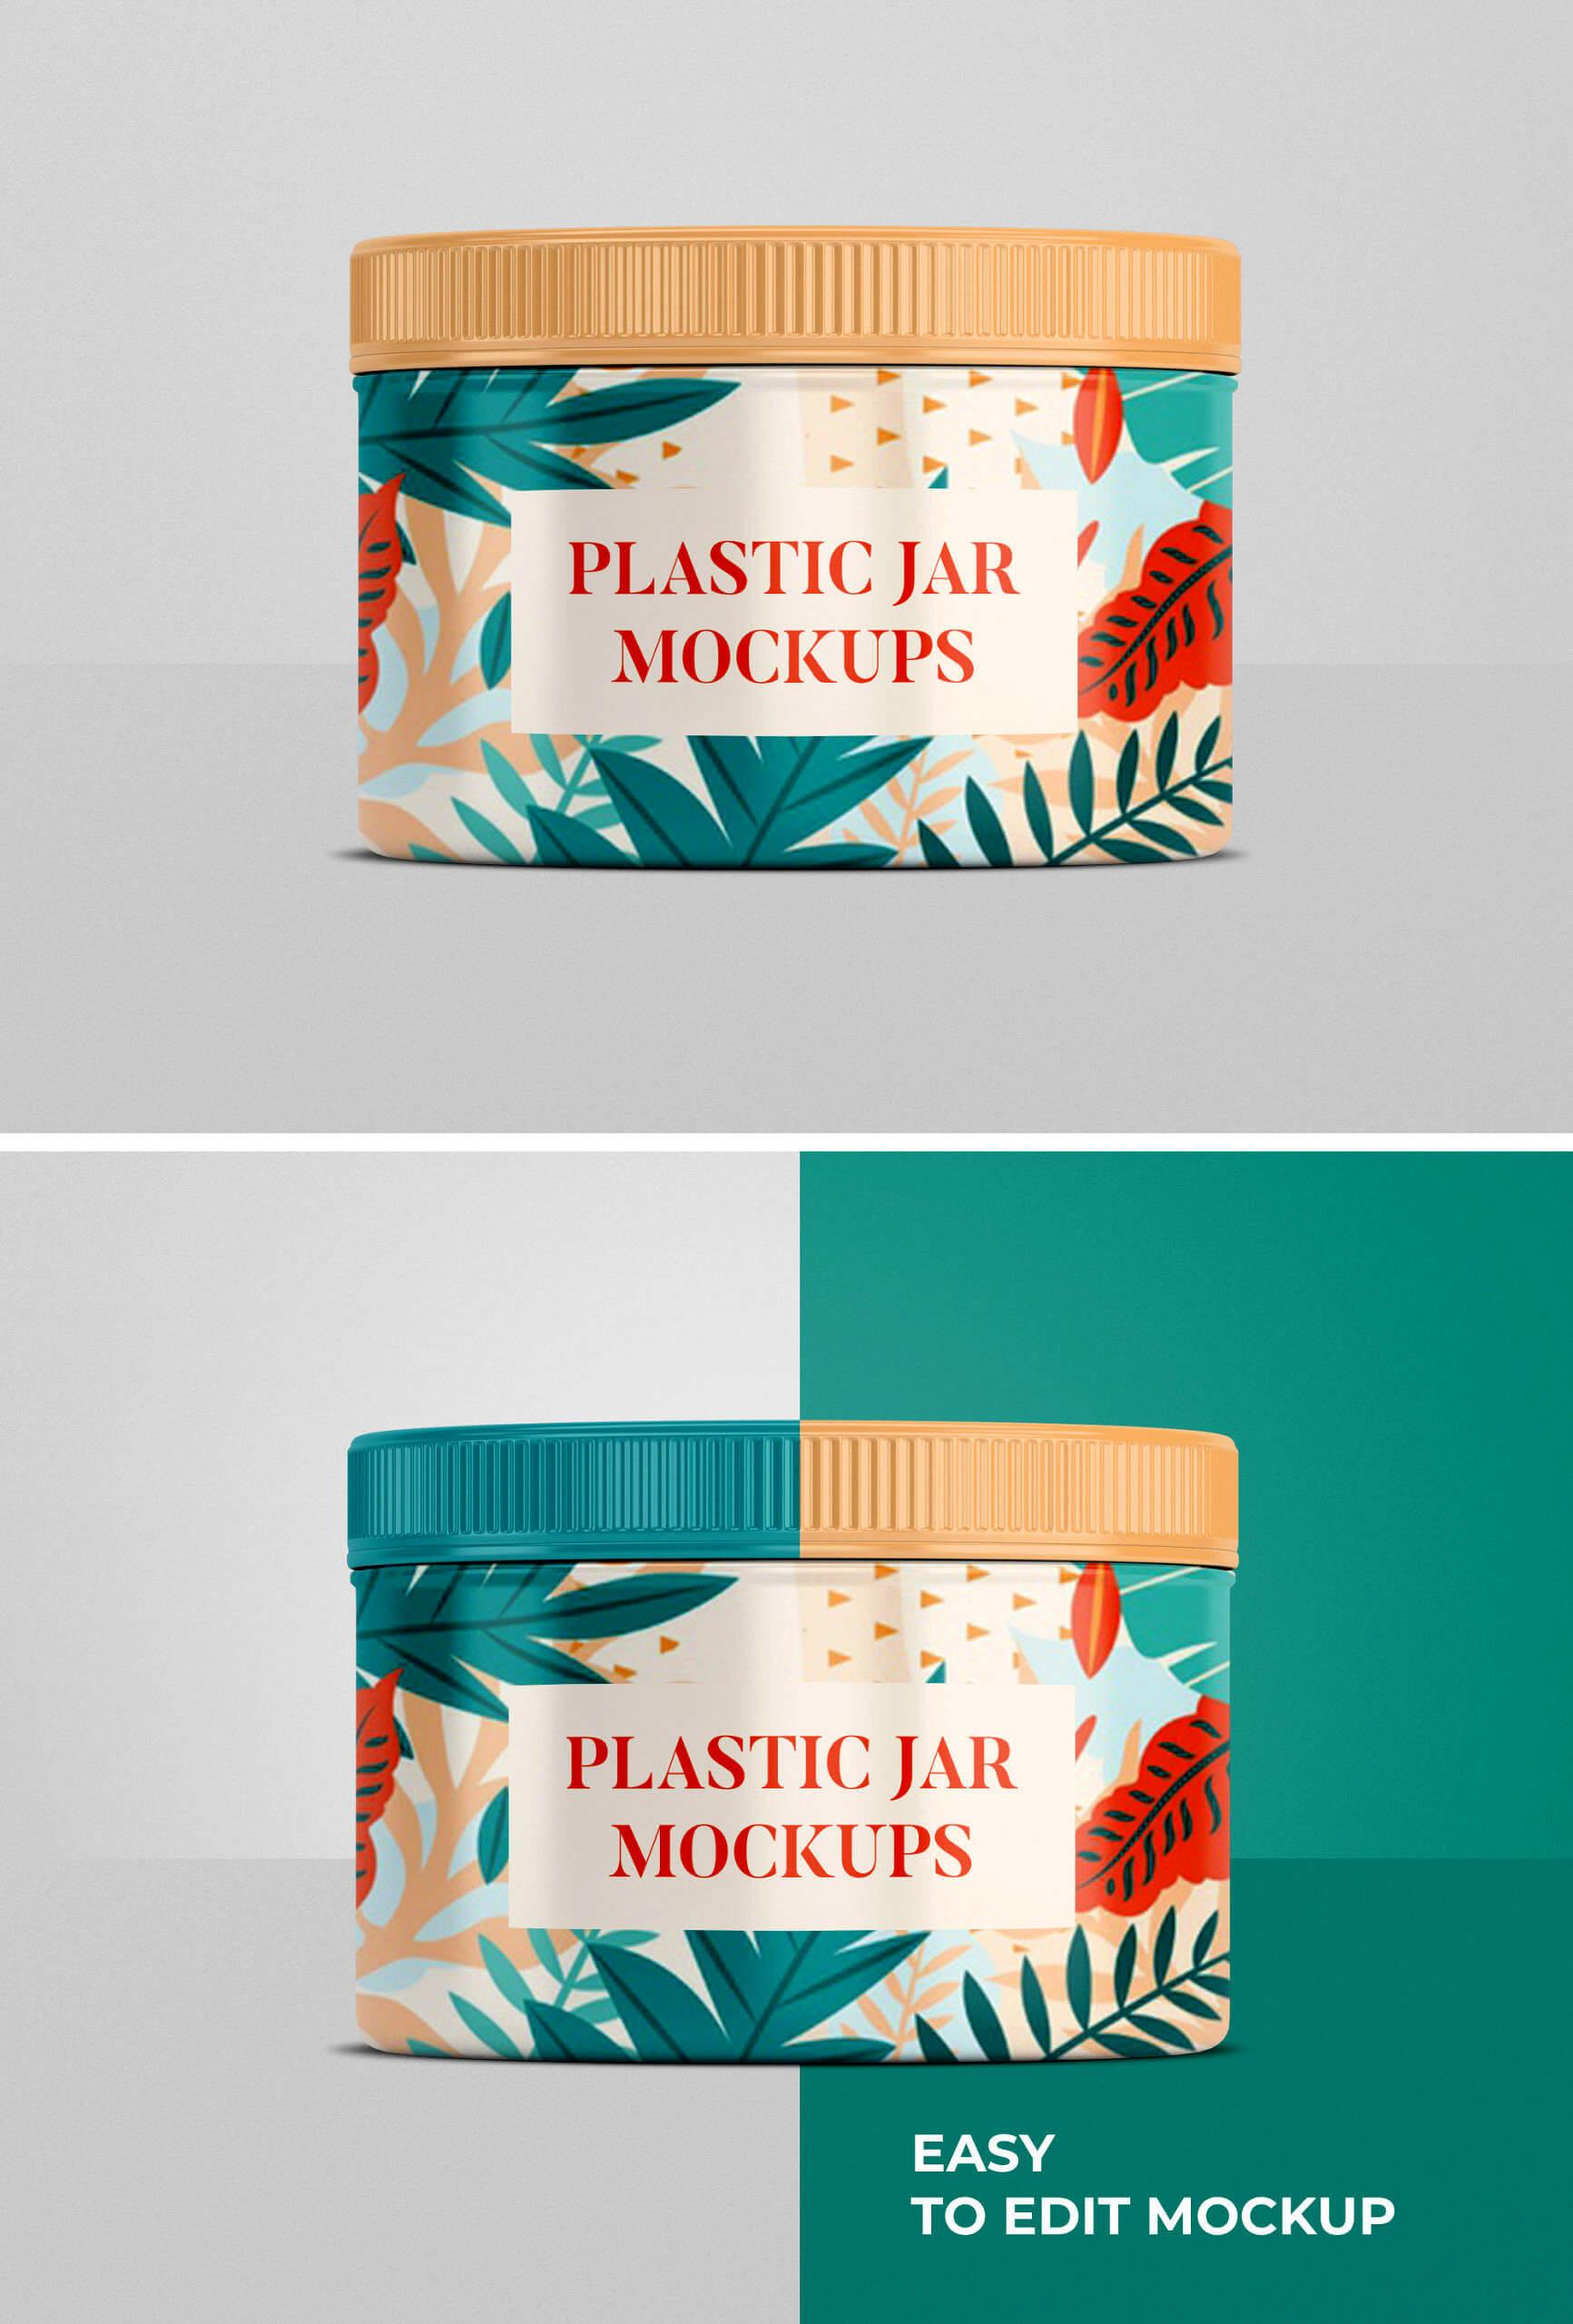 Free Customizable Plastic Jar Mockup PSD Template1